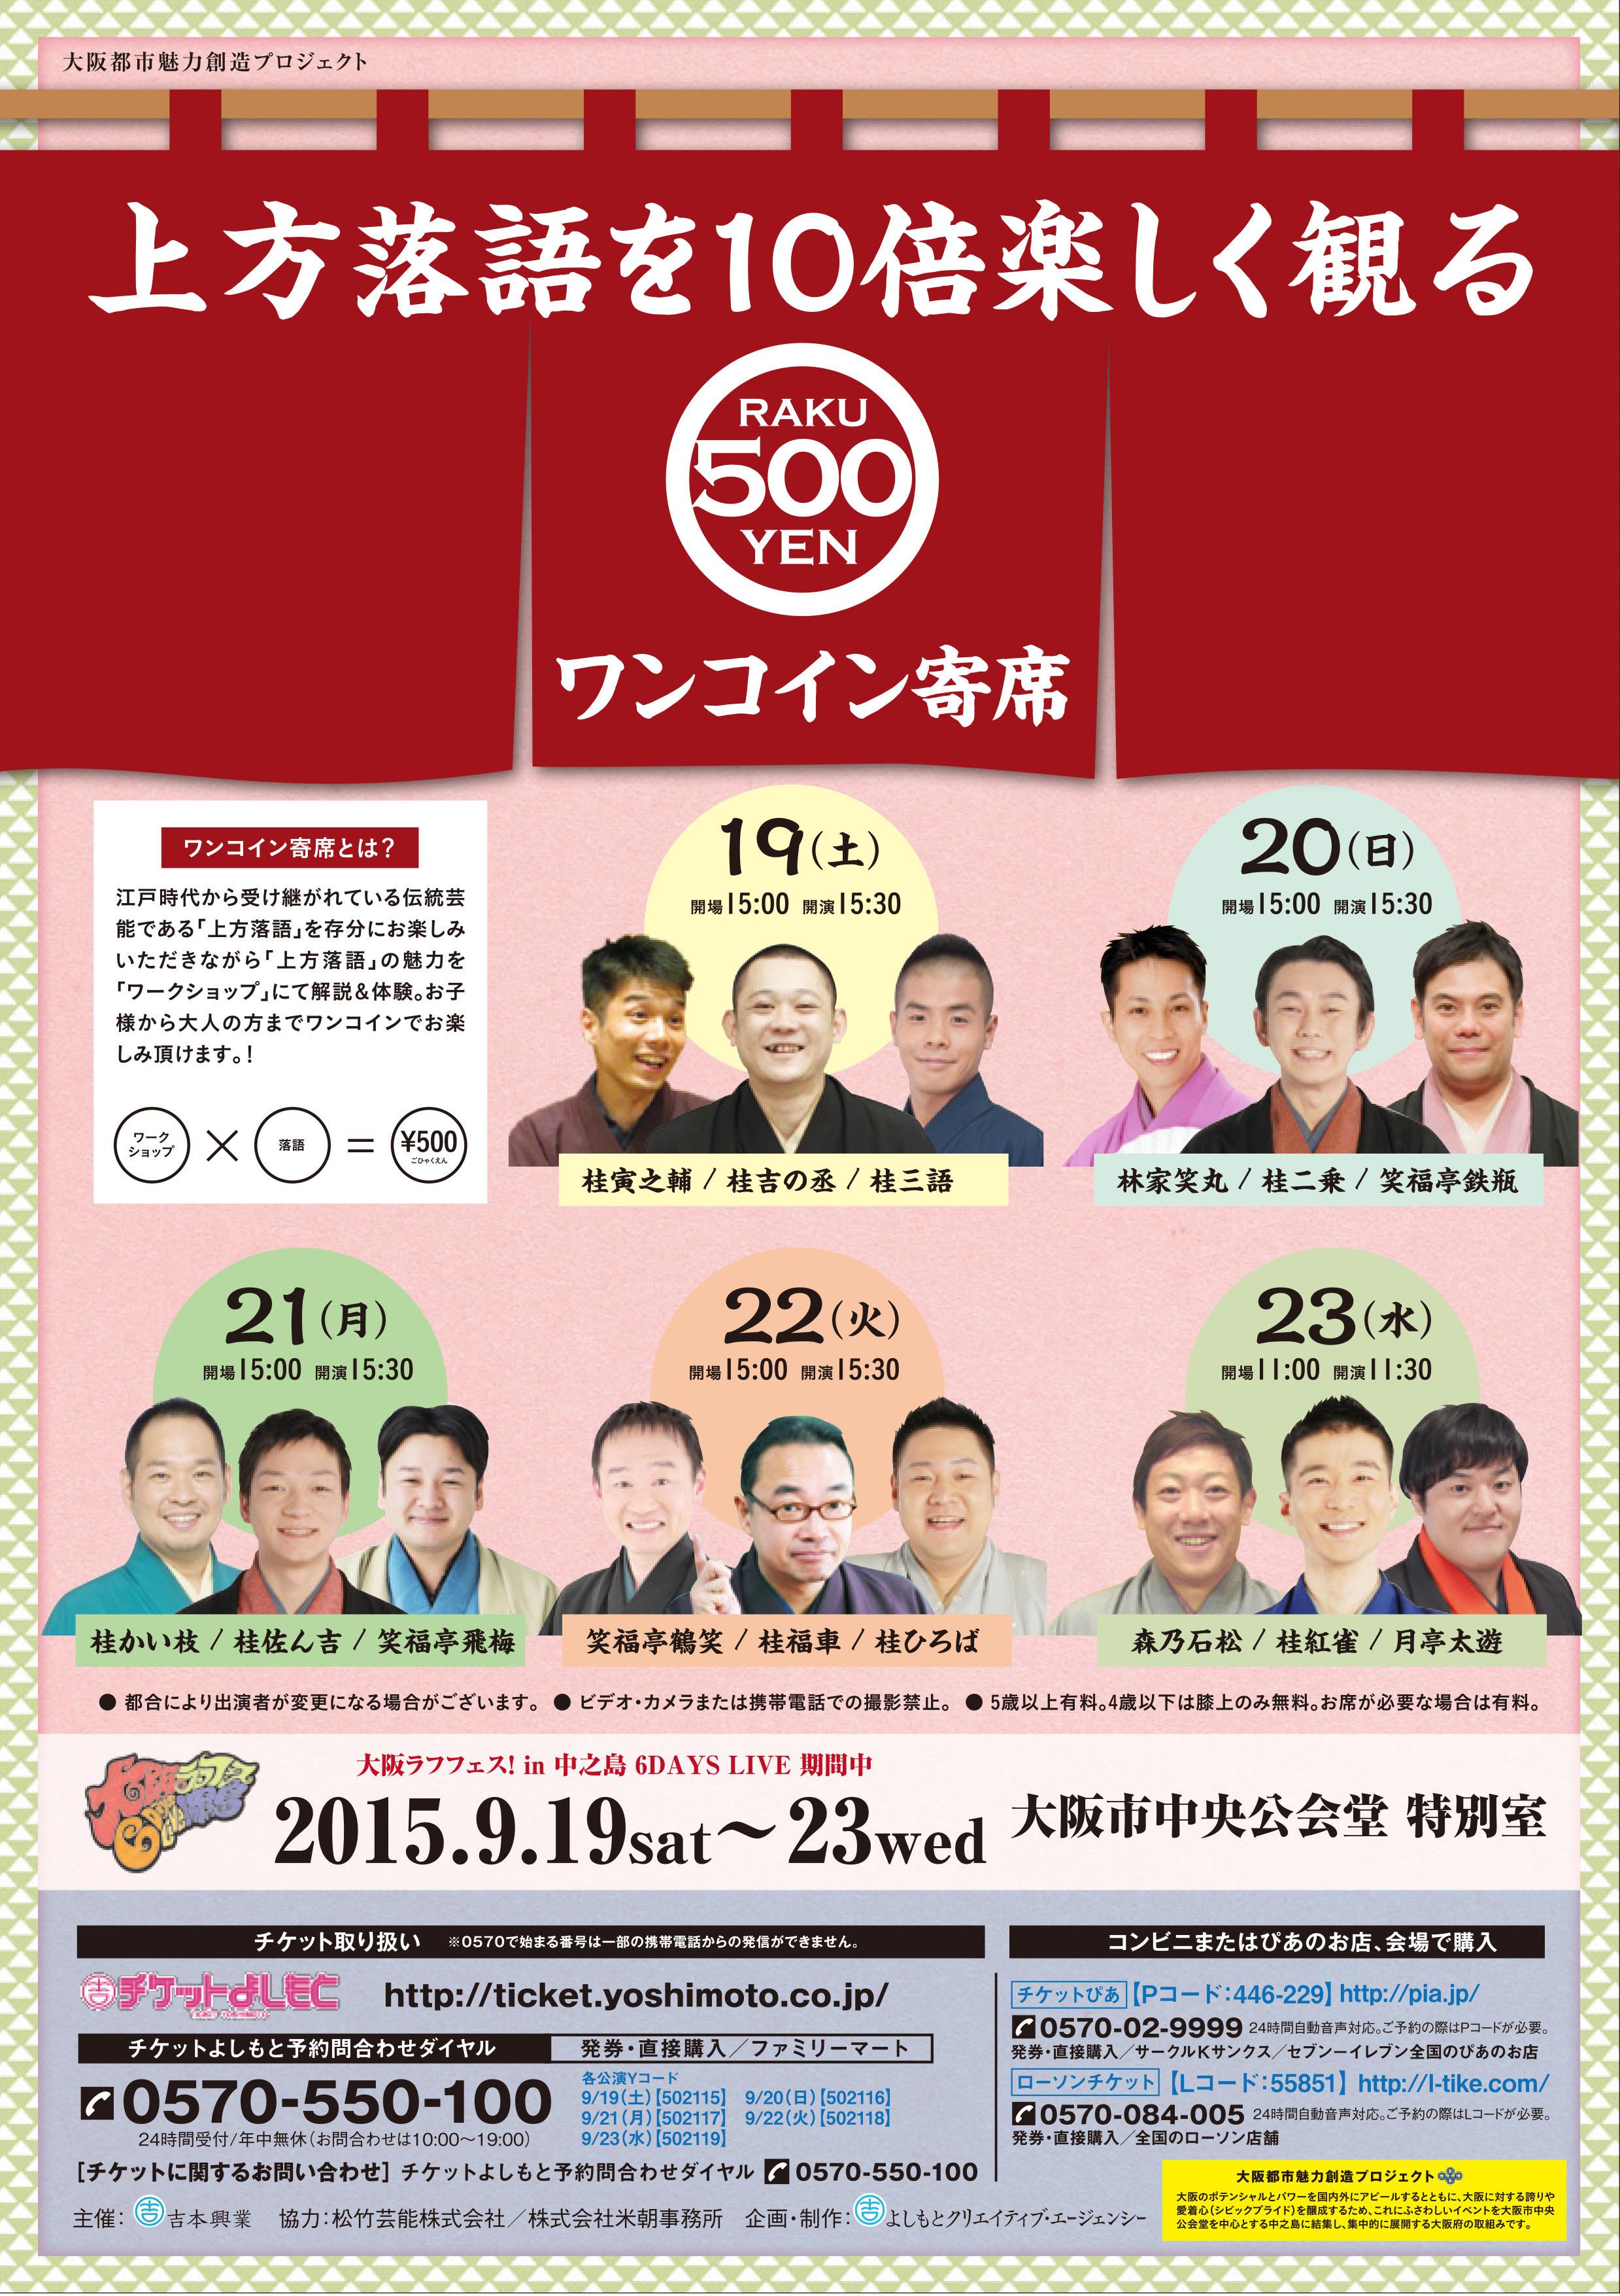 http://www.syumatsu.jp/photos/uncategorized/2015/08/25/20150825170358-abbdffa9fcda66a73a9e054212ca82a6cddab842.jpg